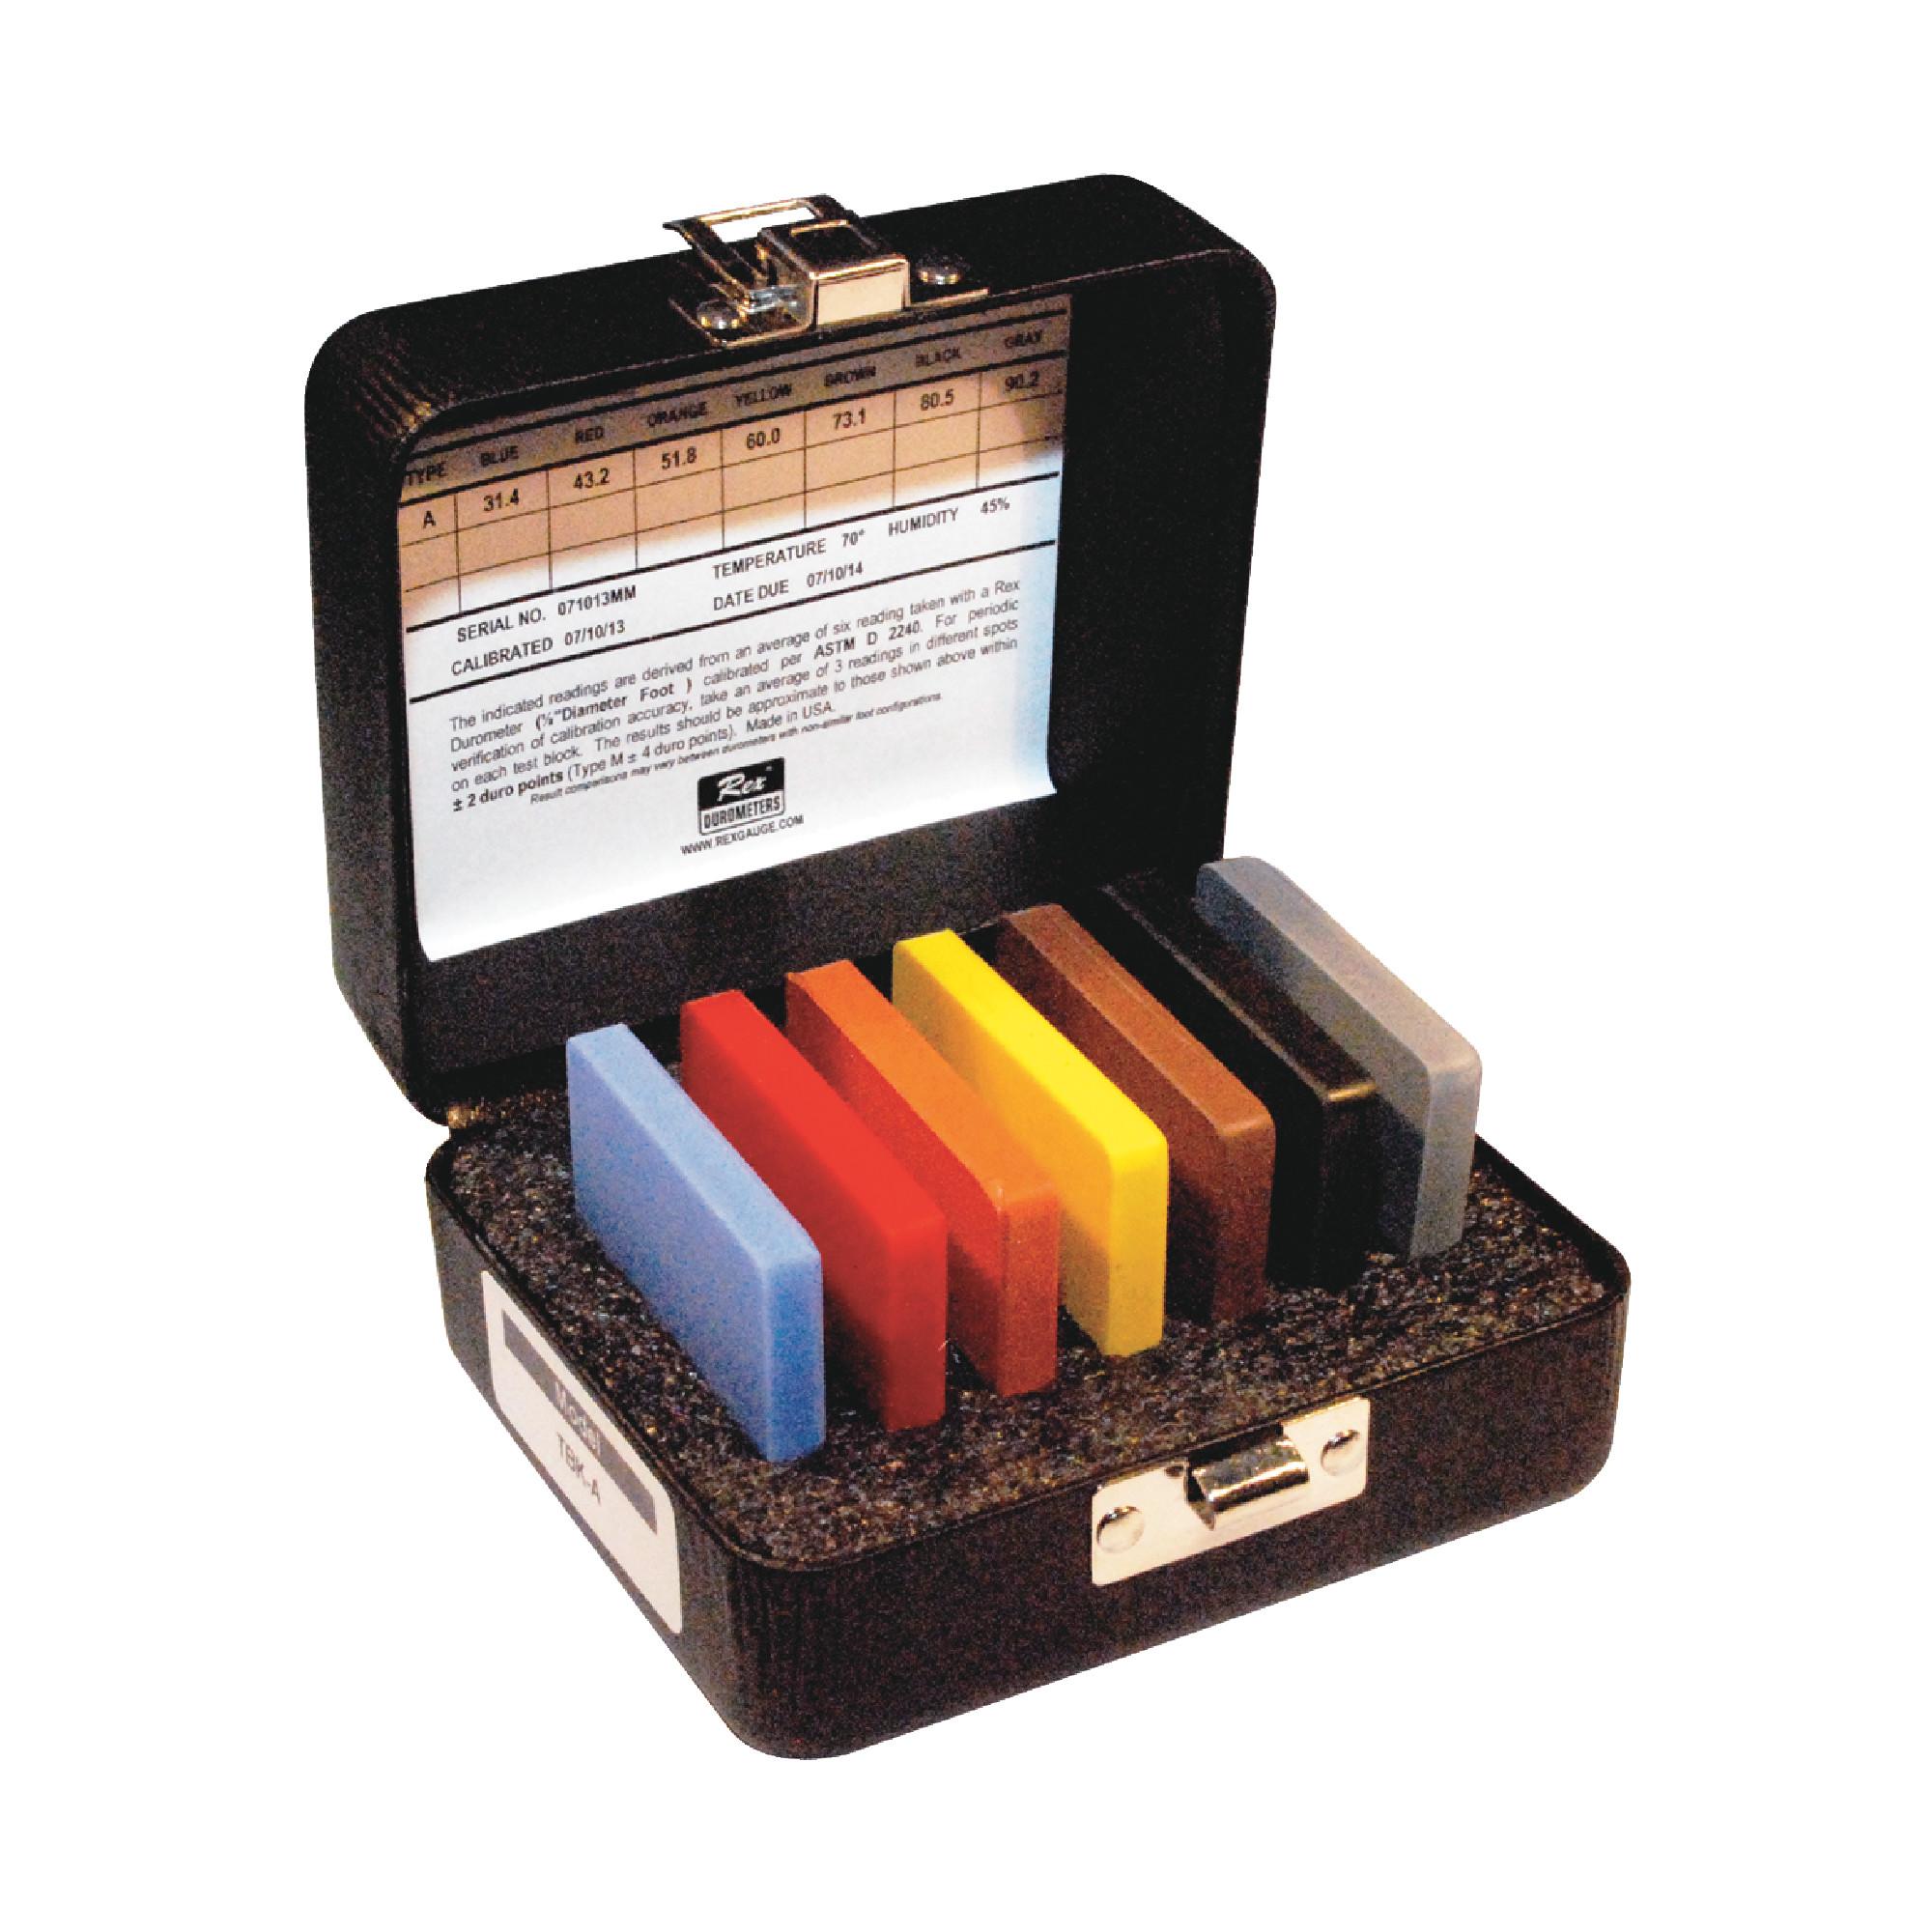 7 Piece Durometer Test Block Kit